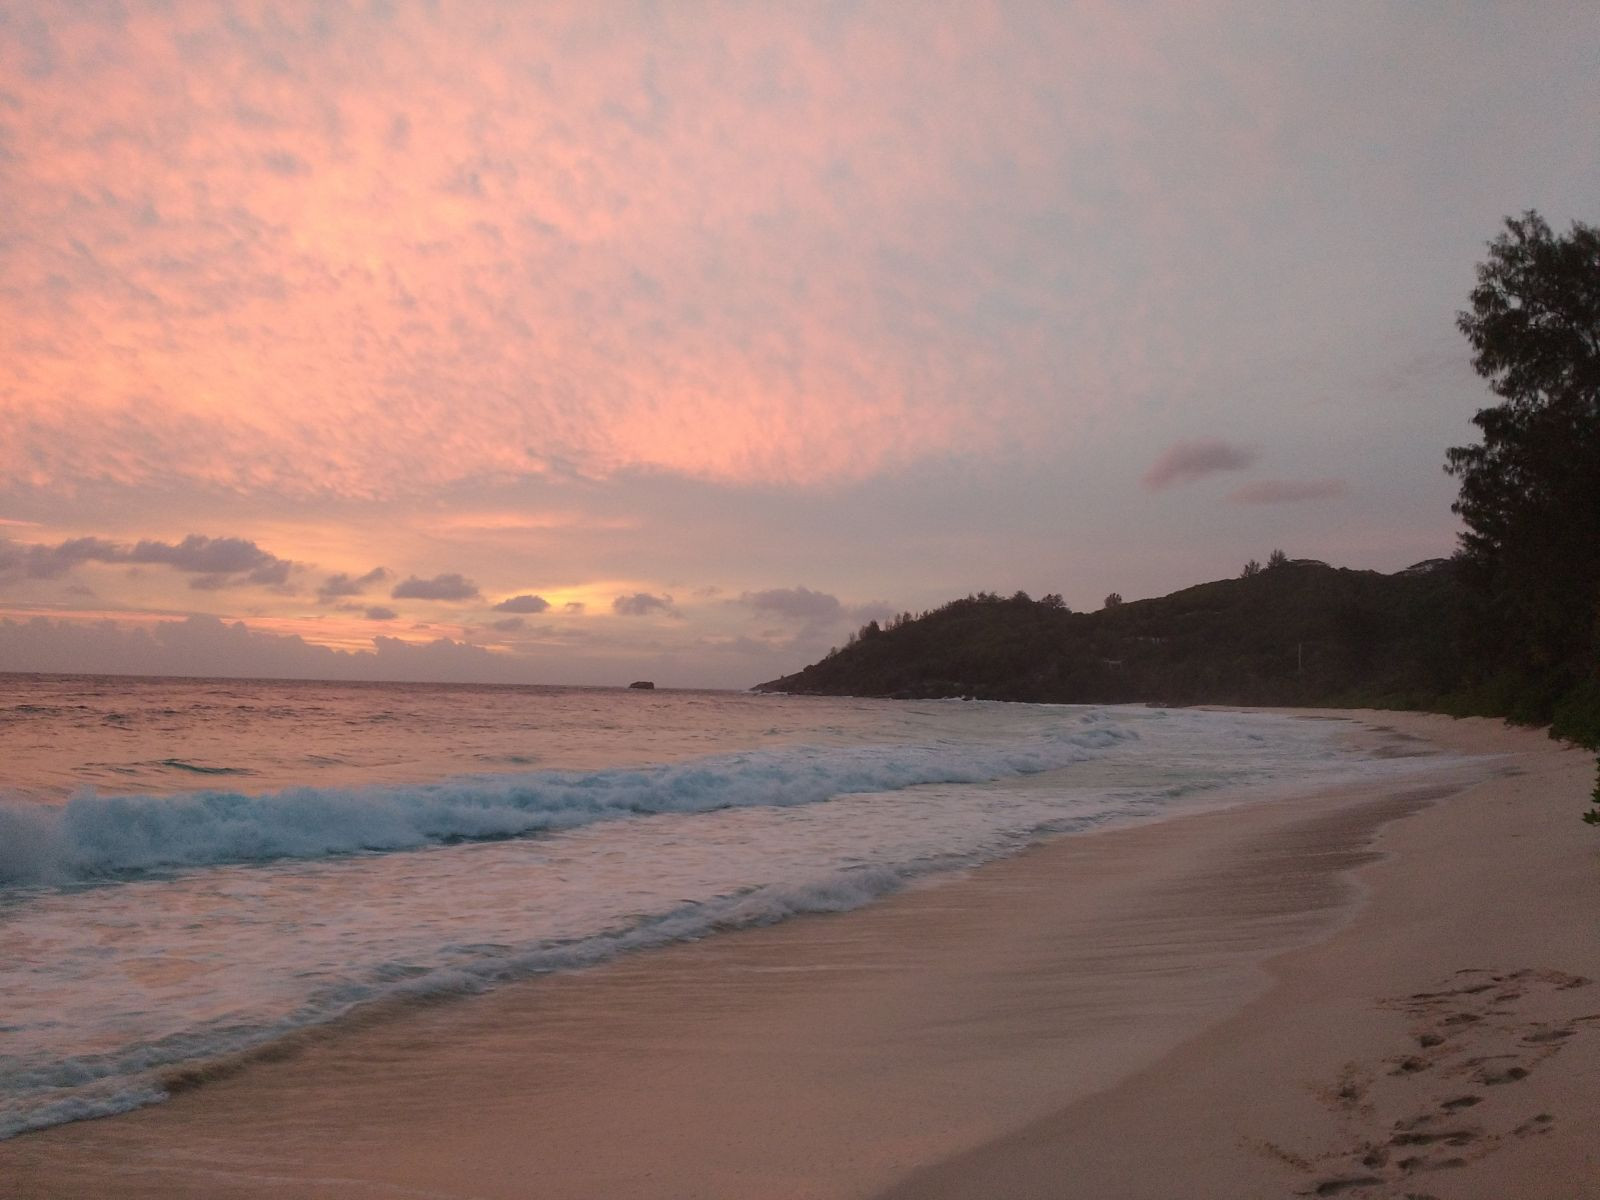 S79/DH5FS Seychelles DX News